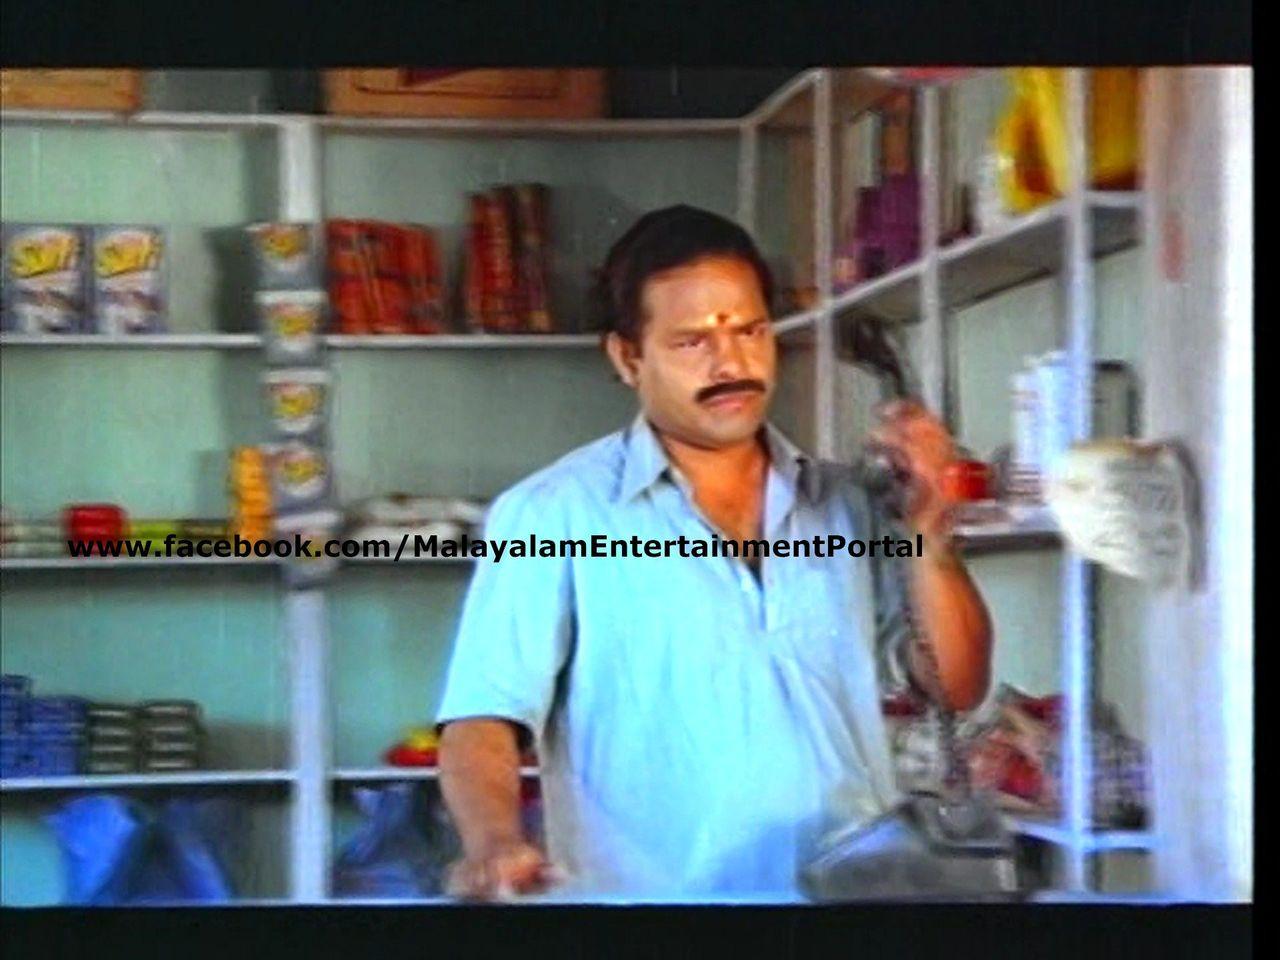 Mukundetta Sumithra Vilikyunnu Saina DVD Screenshots Bscap0009